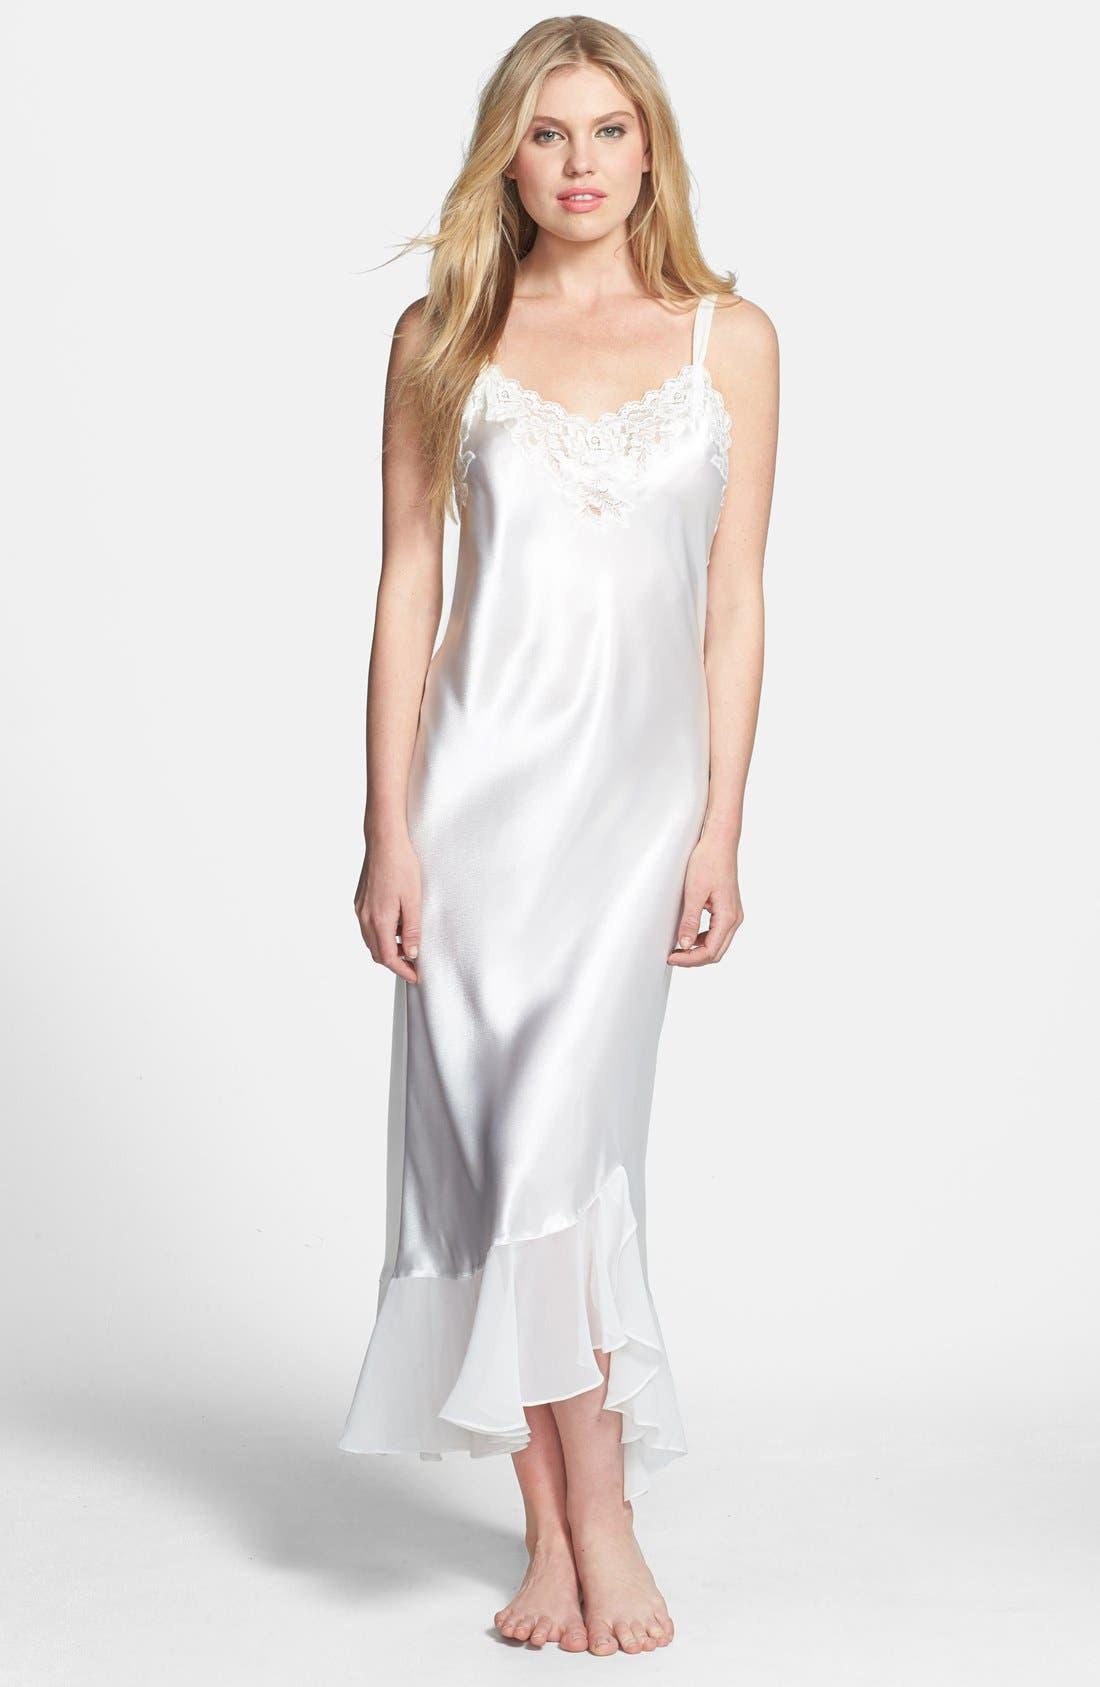 Main Image - Oscar de la Renta Sleepwear 'Evening Bliss' Satin Charmeuse Nightgown